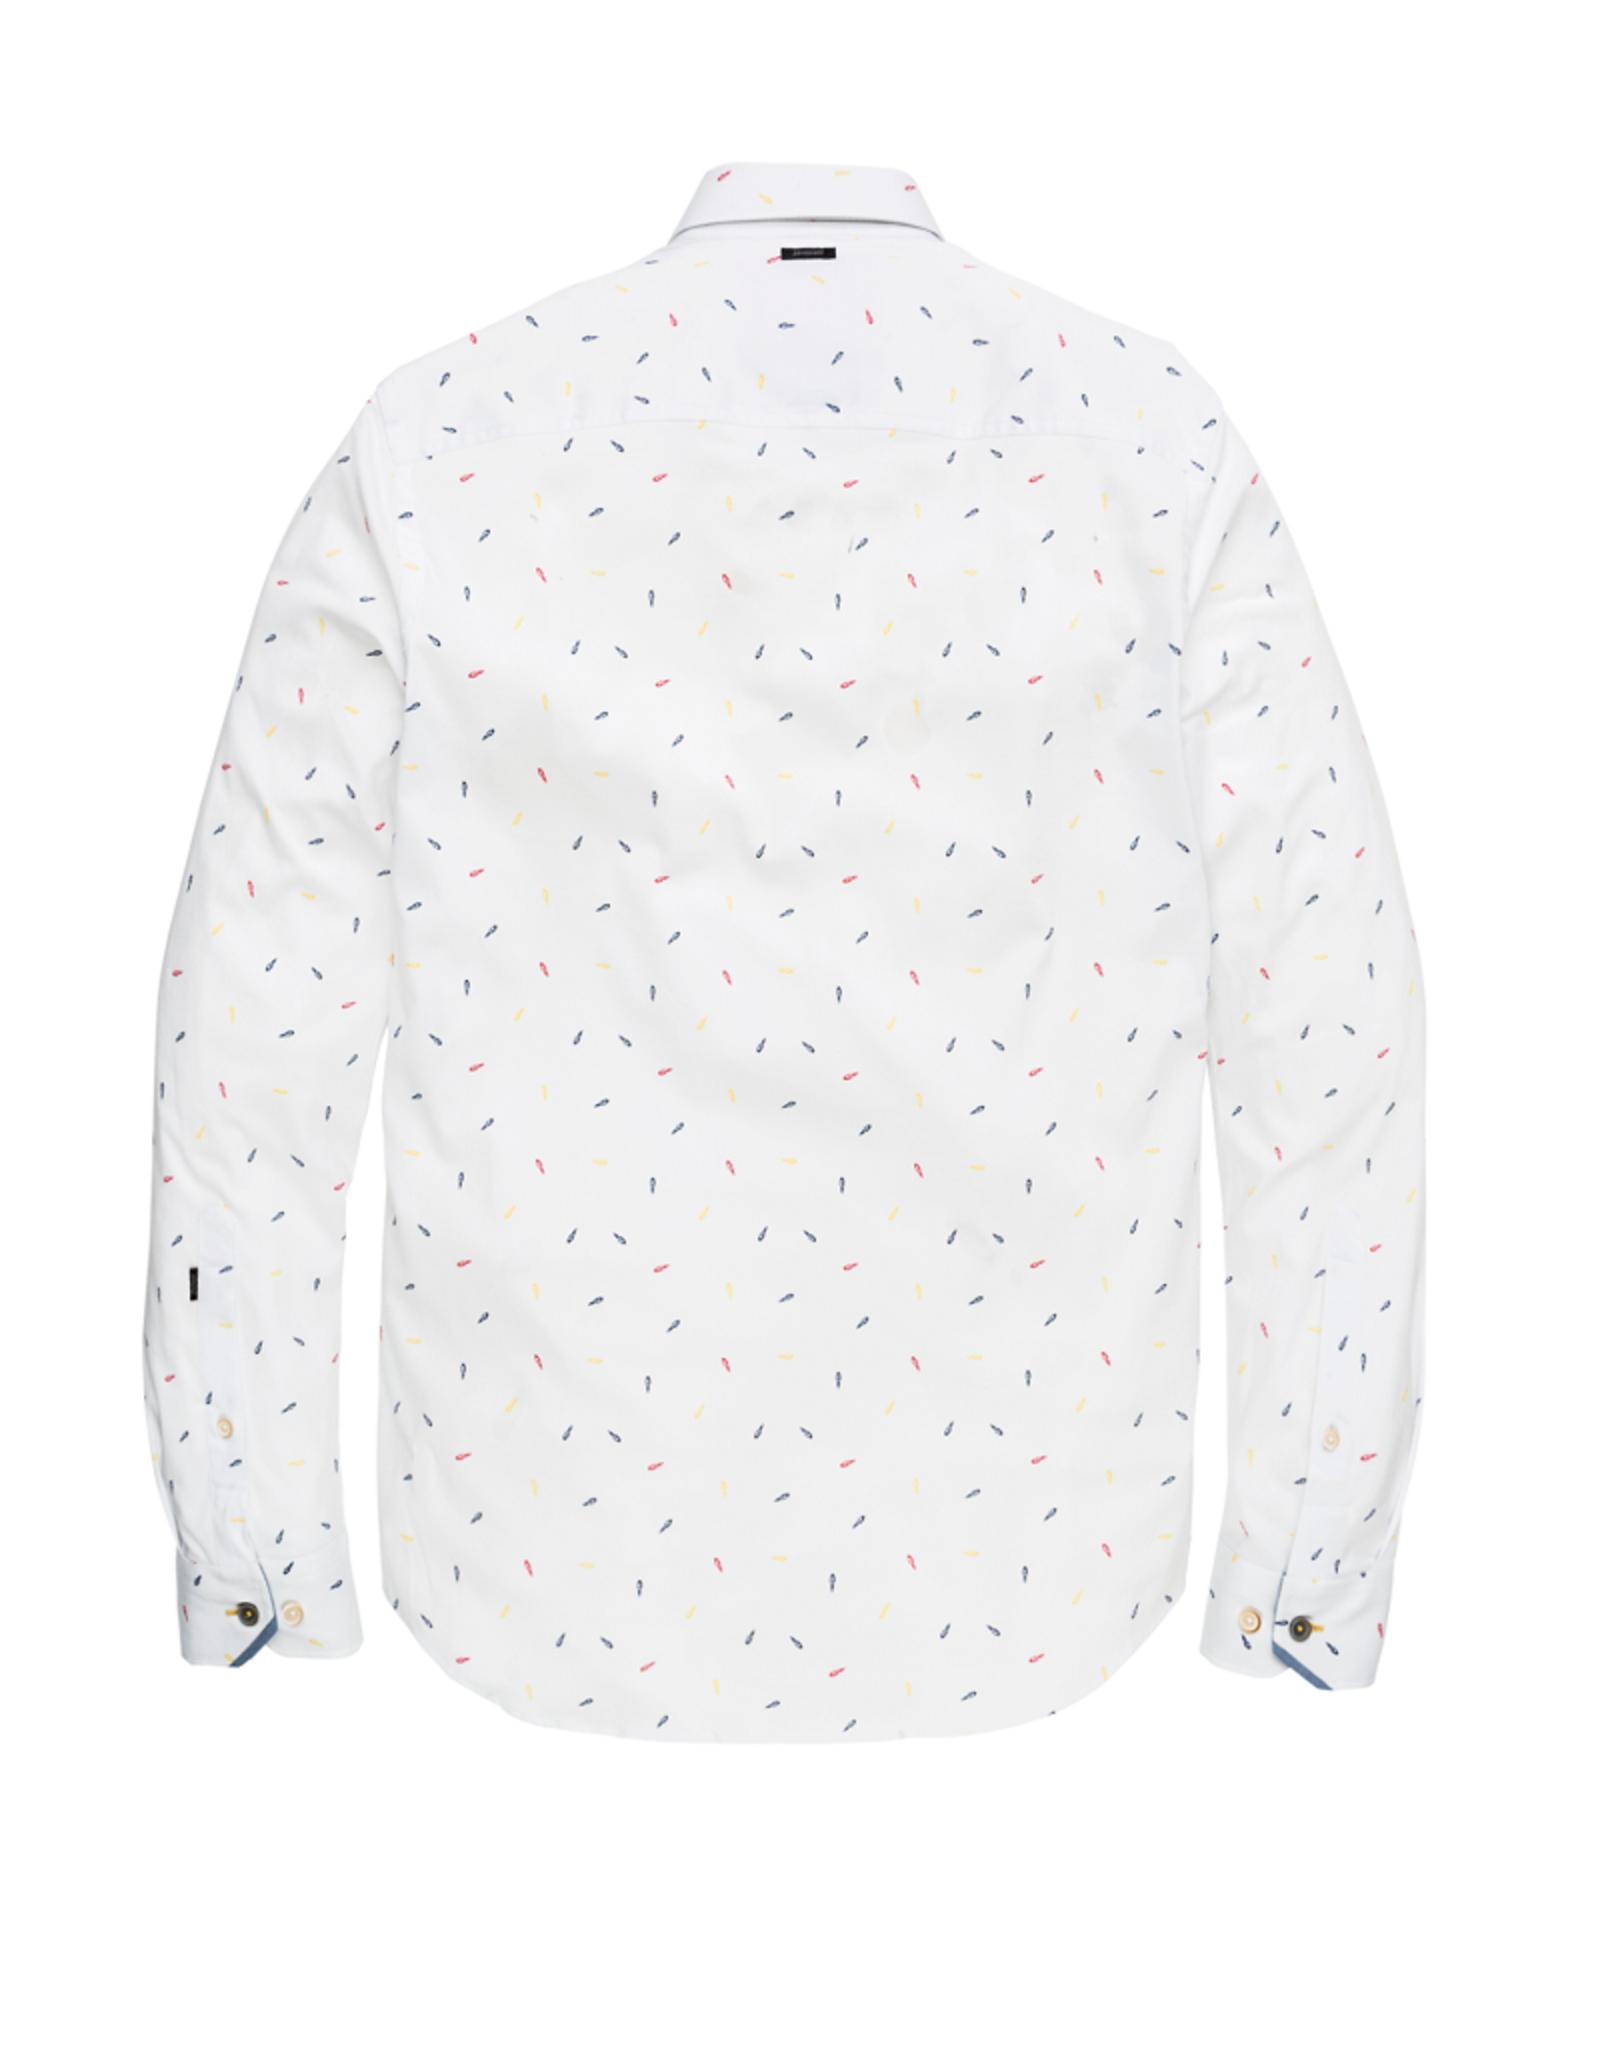 Vanguard Vanguard long sleeve shirt print on structured fabric